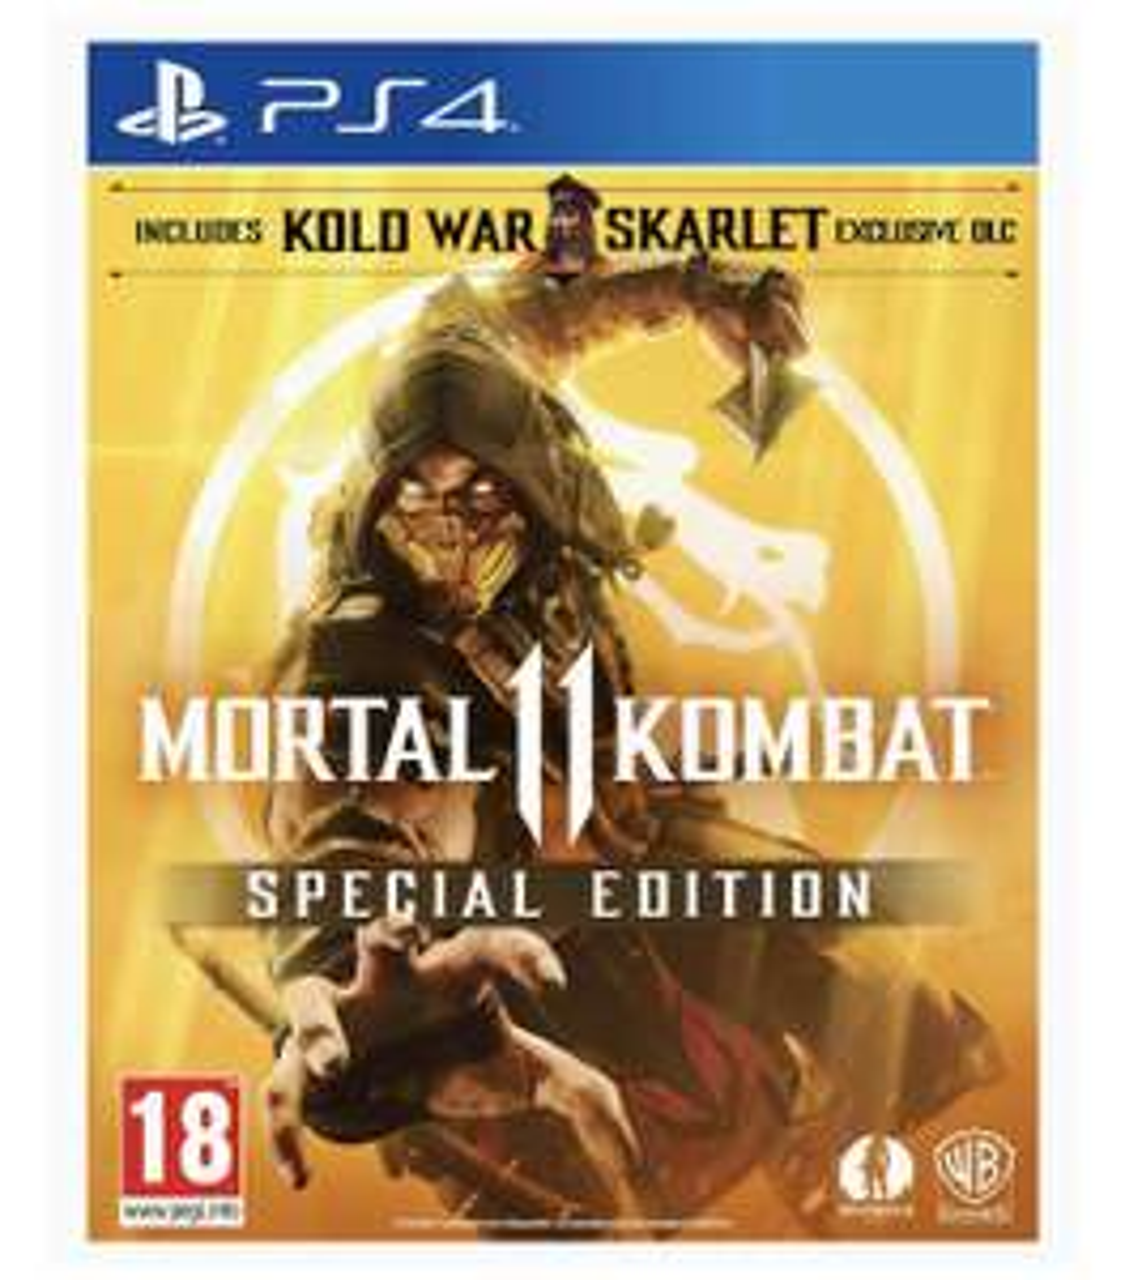 Jeu Mortal Kombat 11 sur PS4 - Special Edition